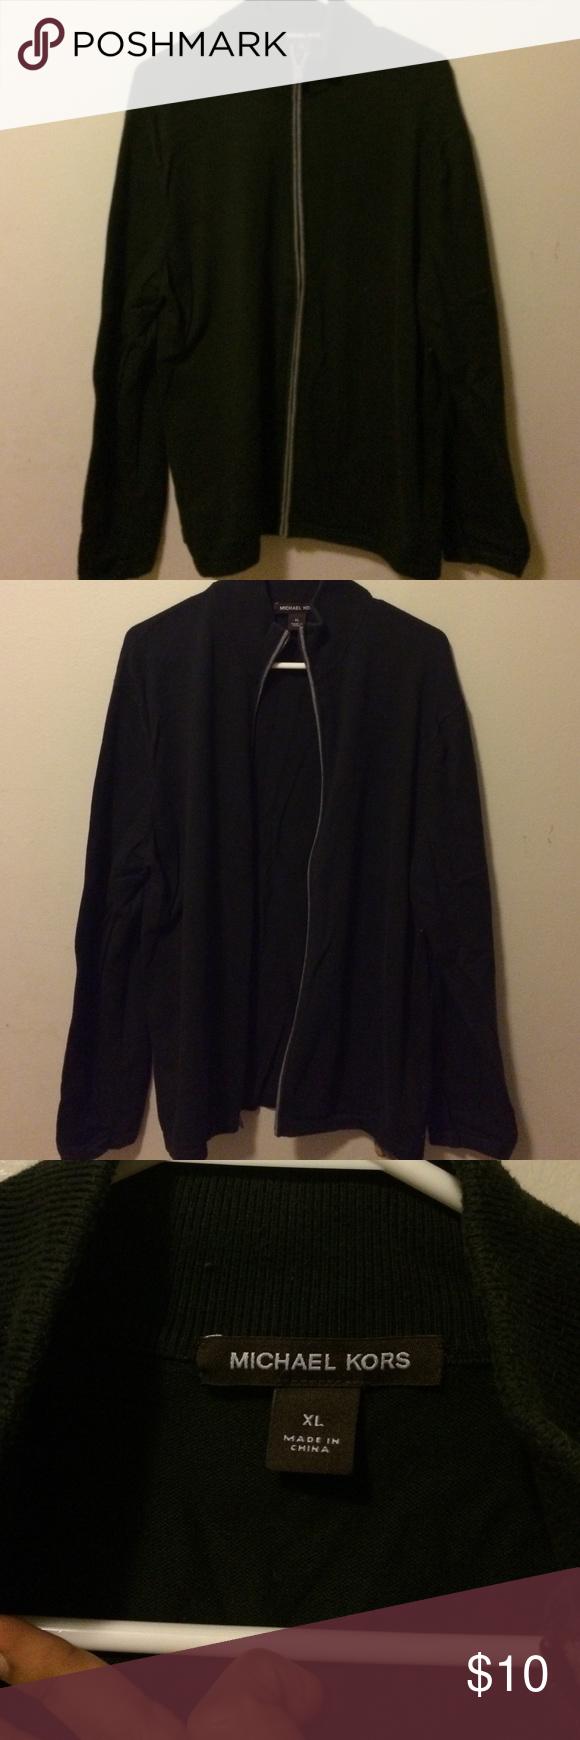 Black Michael Kors sweater Good condition Michael Kors Sweater Michael Kors Sweaters Zip Up